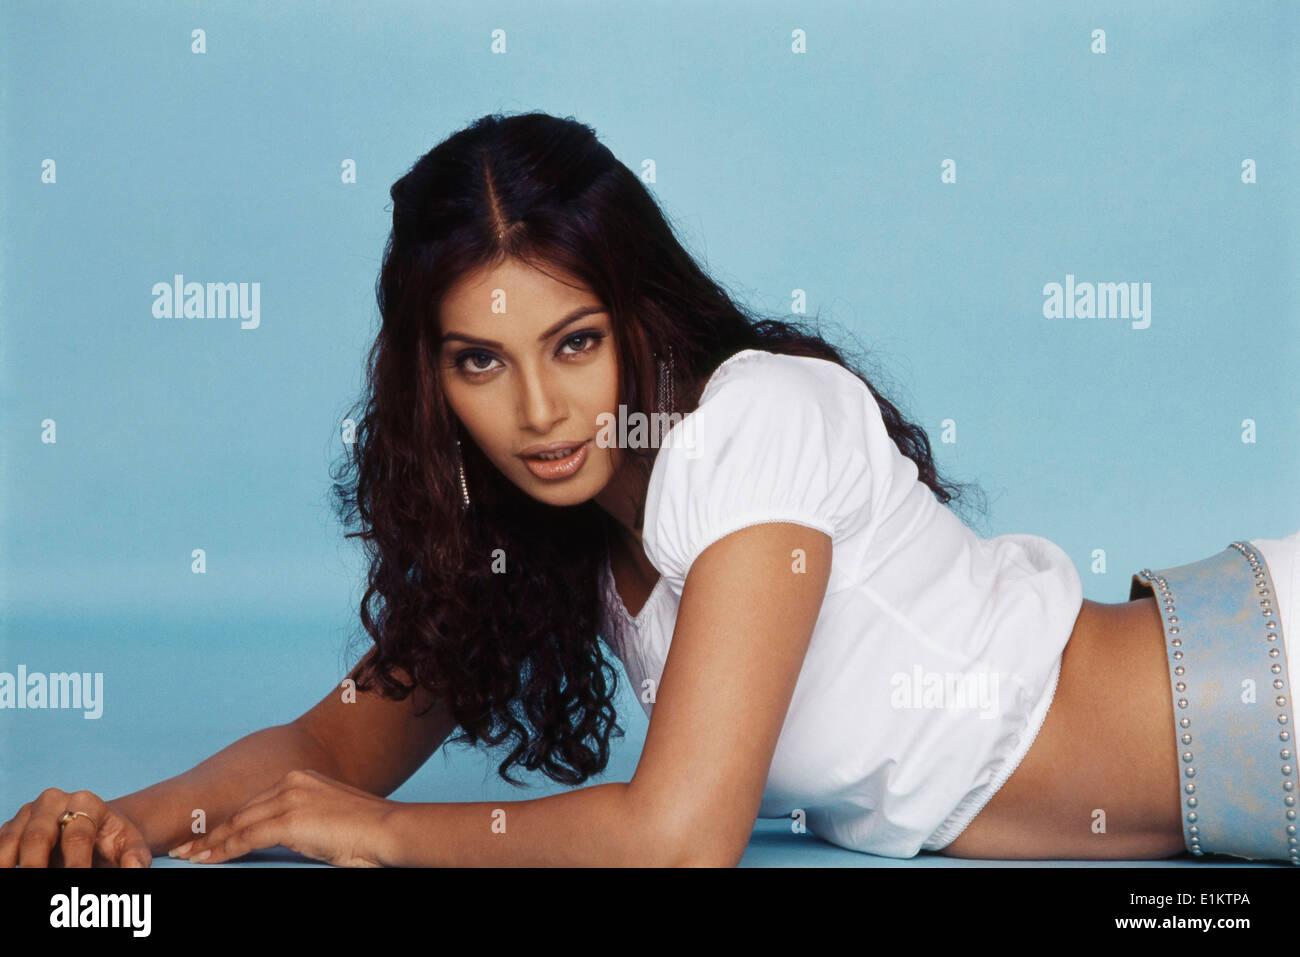 Portrait of Bipasha Basu Indian film actress - Stock Image